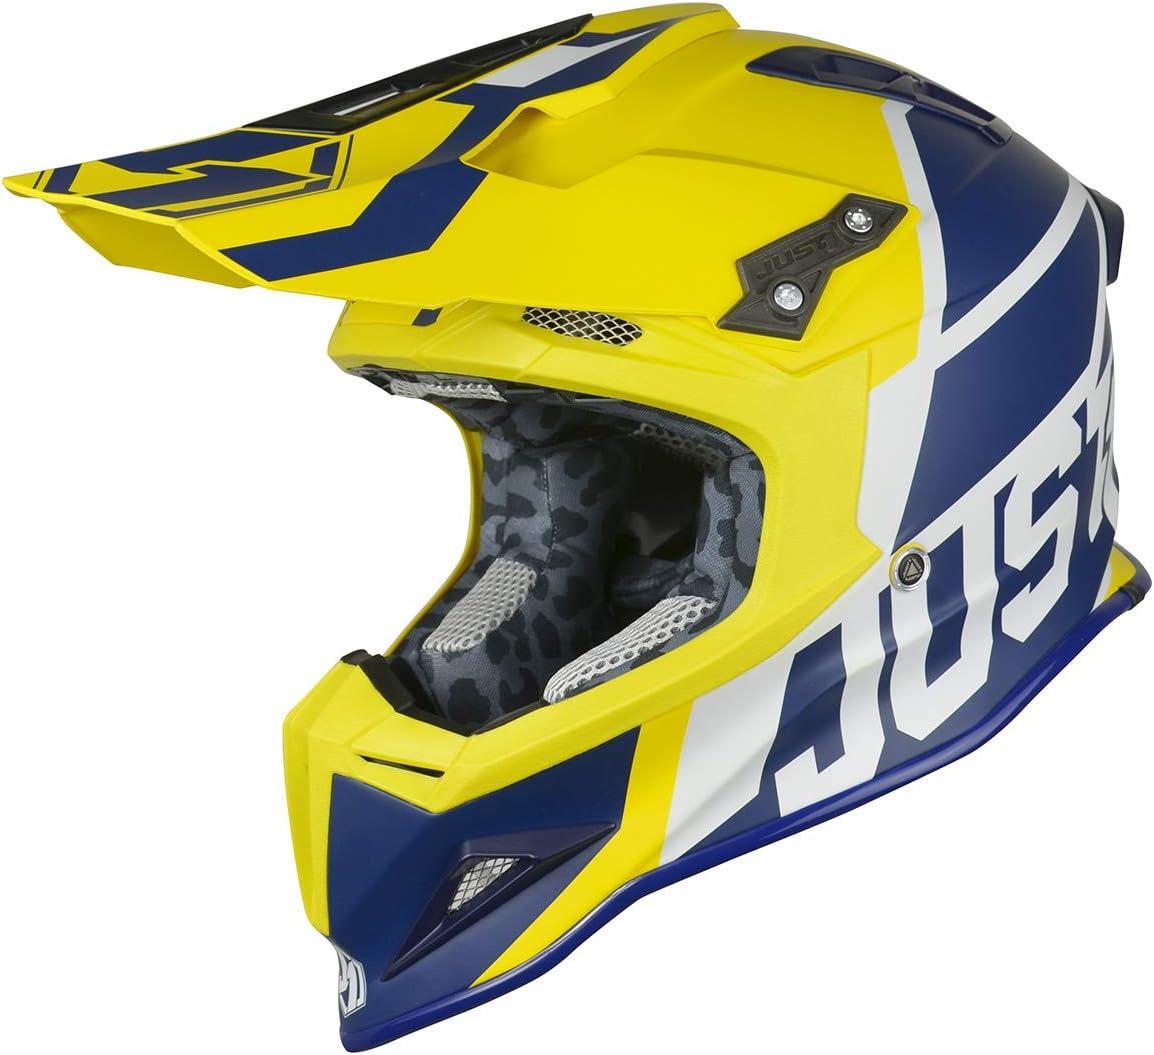 JUST1 J12 Unit Carbon Fiber Shell Off-Road Adult Motorcross Motorcycle helmet Flat White, Carbon Unit Blue Yellow-Large